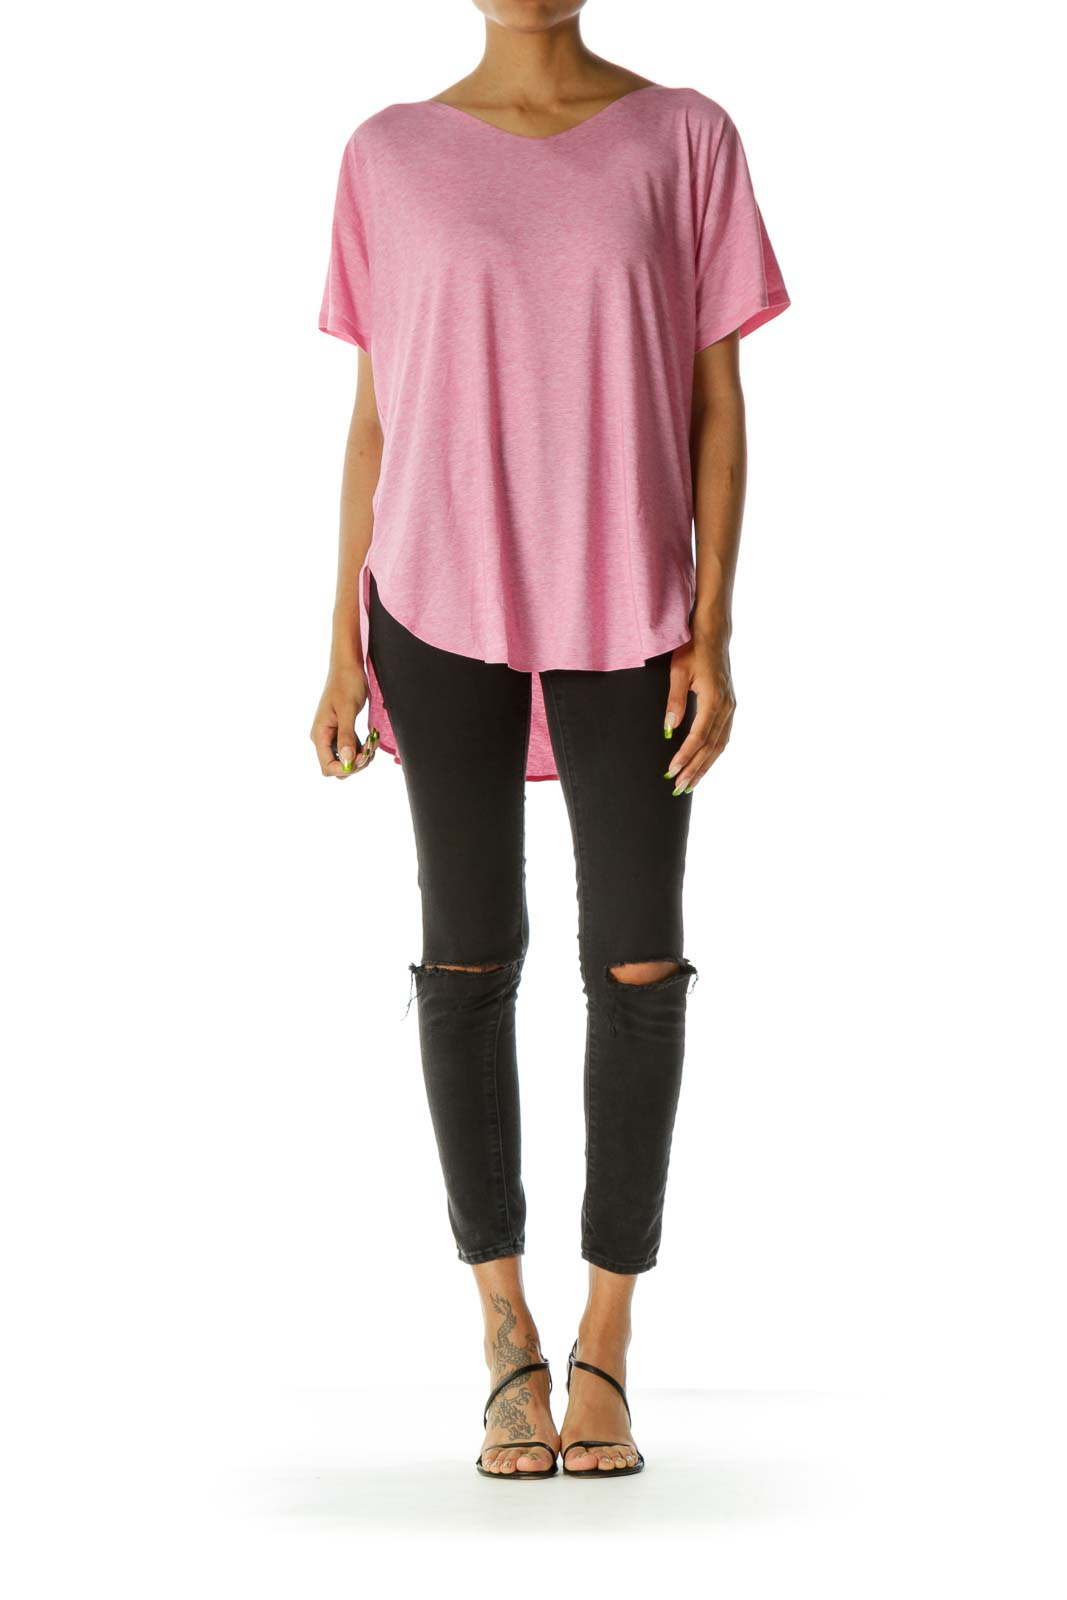 Pink Short Sleeve Round Neck Top